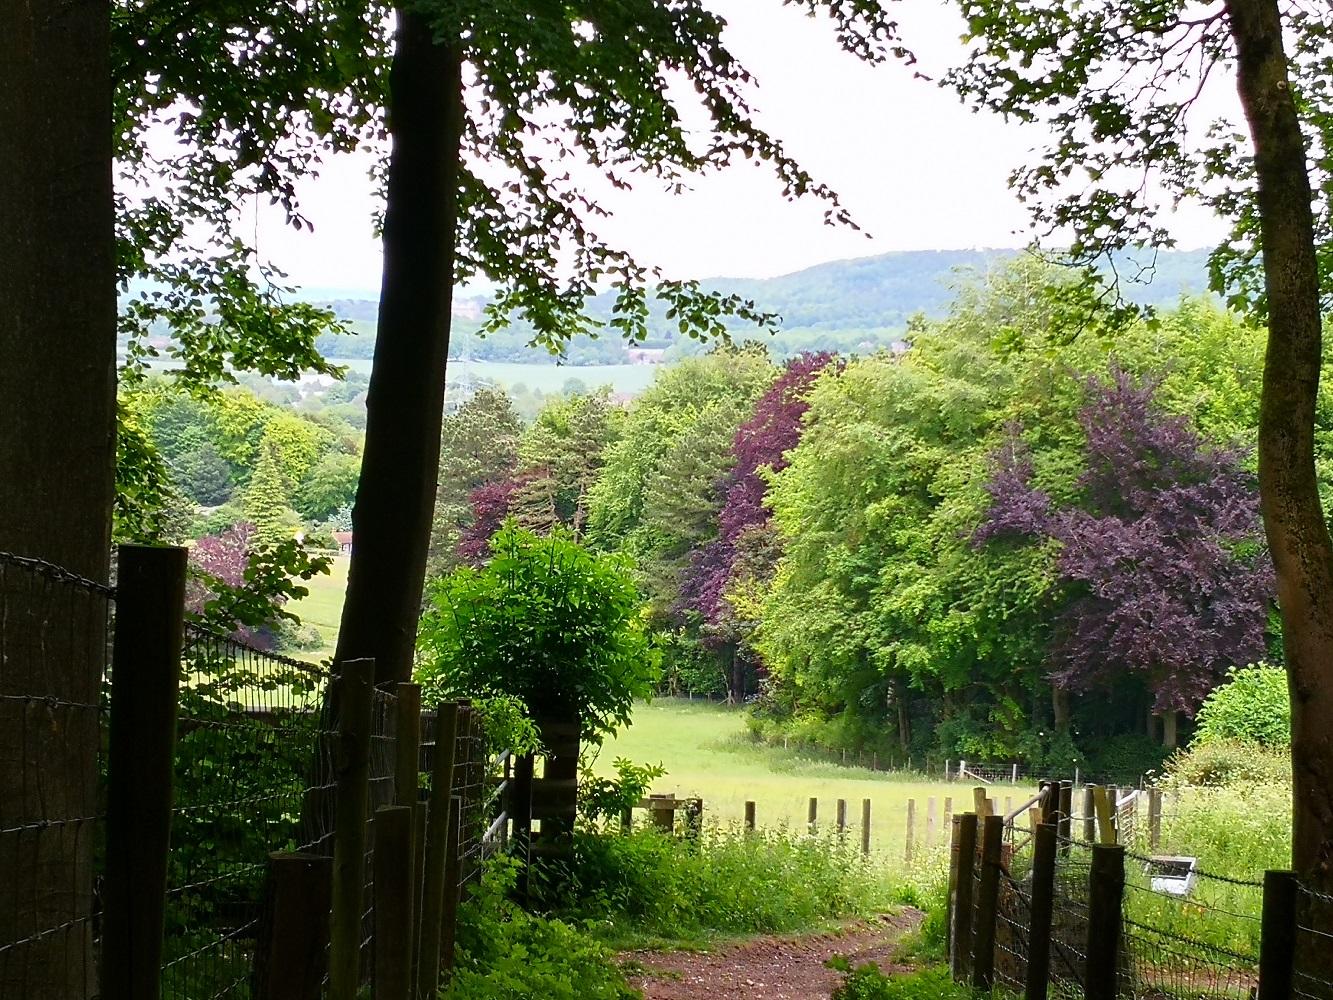 Chilterns woodland